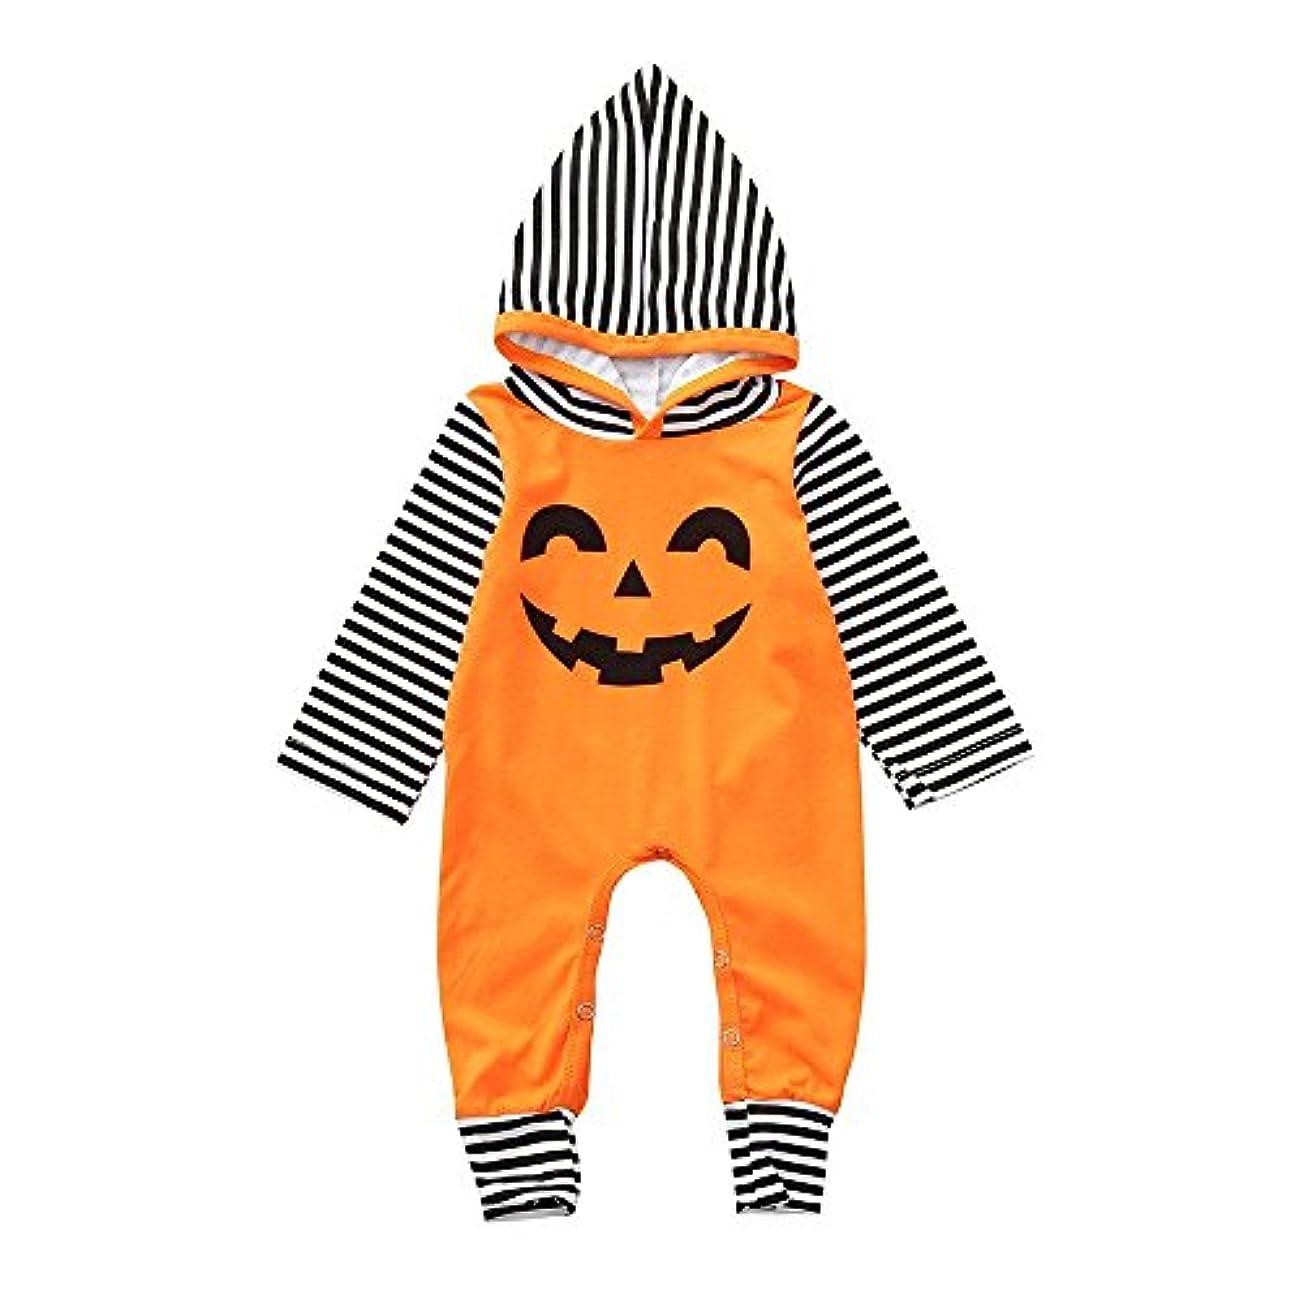 BHKK 子供 幼児少年少女ロングスリーブフード付きロンパージャンプススイートハロウィーンデコレーション服装 6ヶ月 - 24ヶ月 12ヶ月